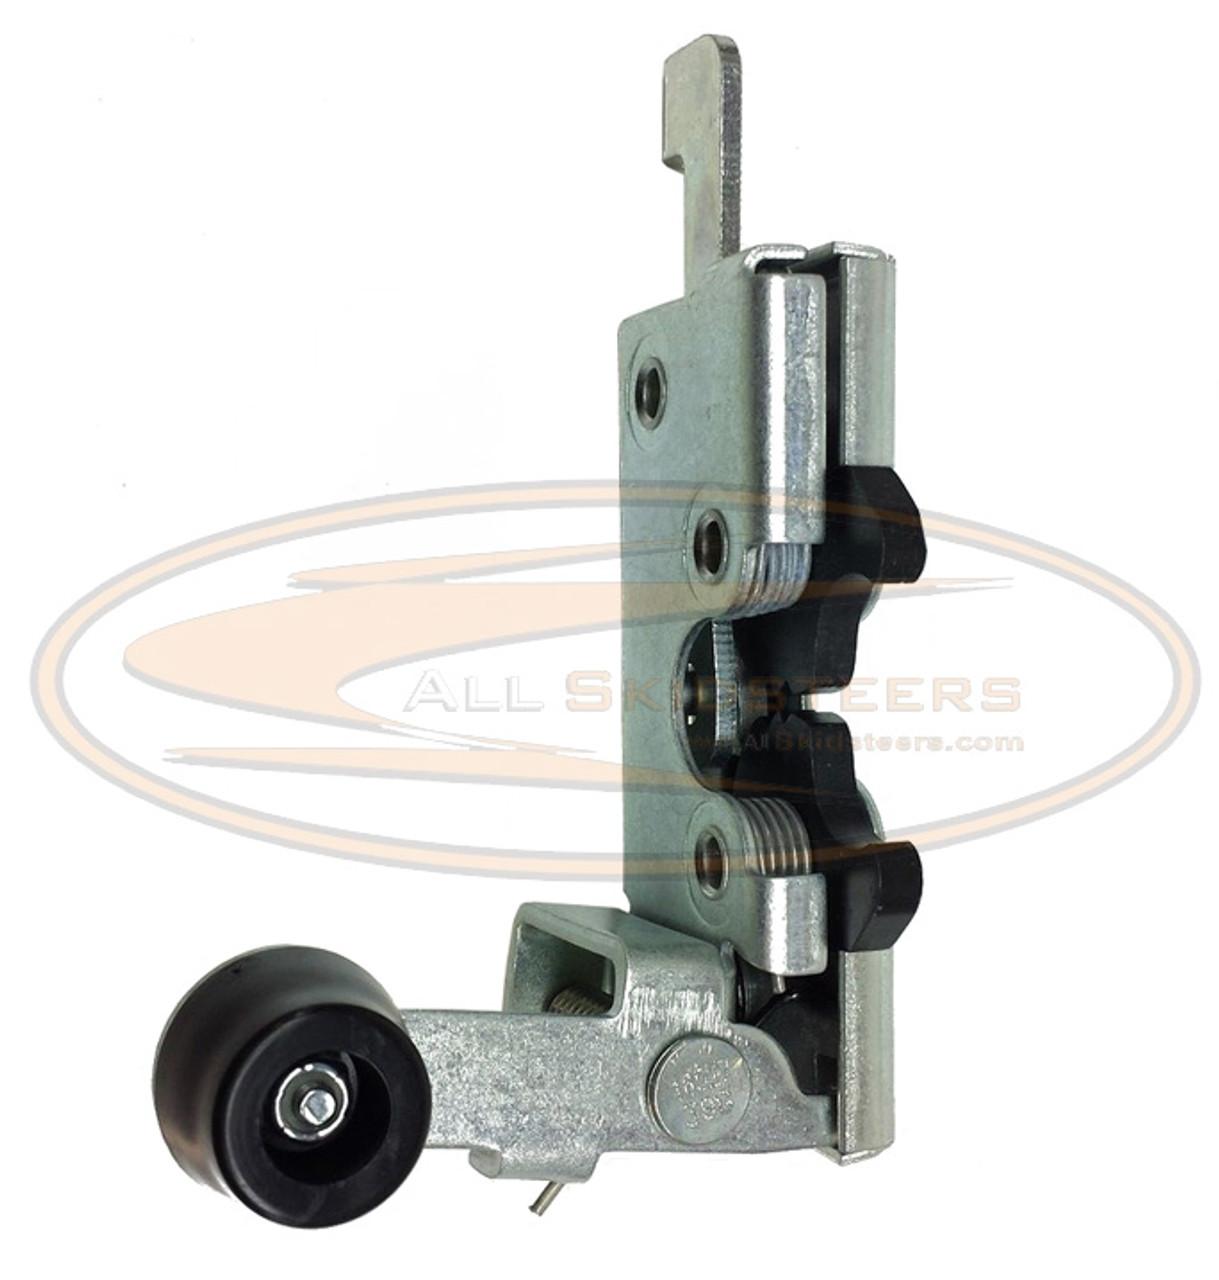 Front Door Latch without Sensor for Bobcat® 751 753 763 773 863 864 873 883  sc 1 st  All Skidsteers.com bobcat parts skid steer parts & Front Door Latch without Sensor for Bobcat® 751 753 763 773 863 864 ...